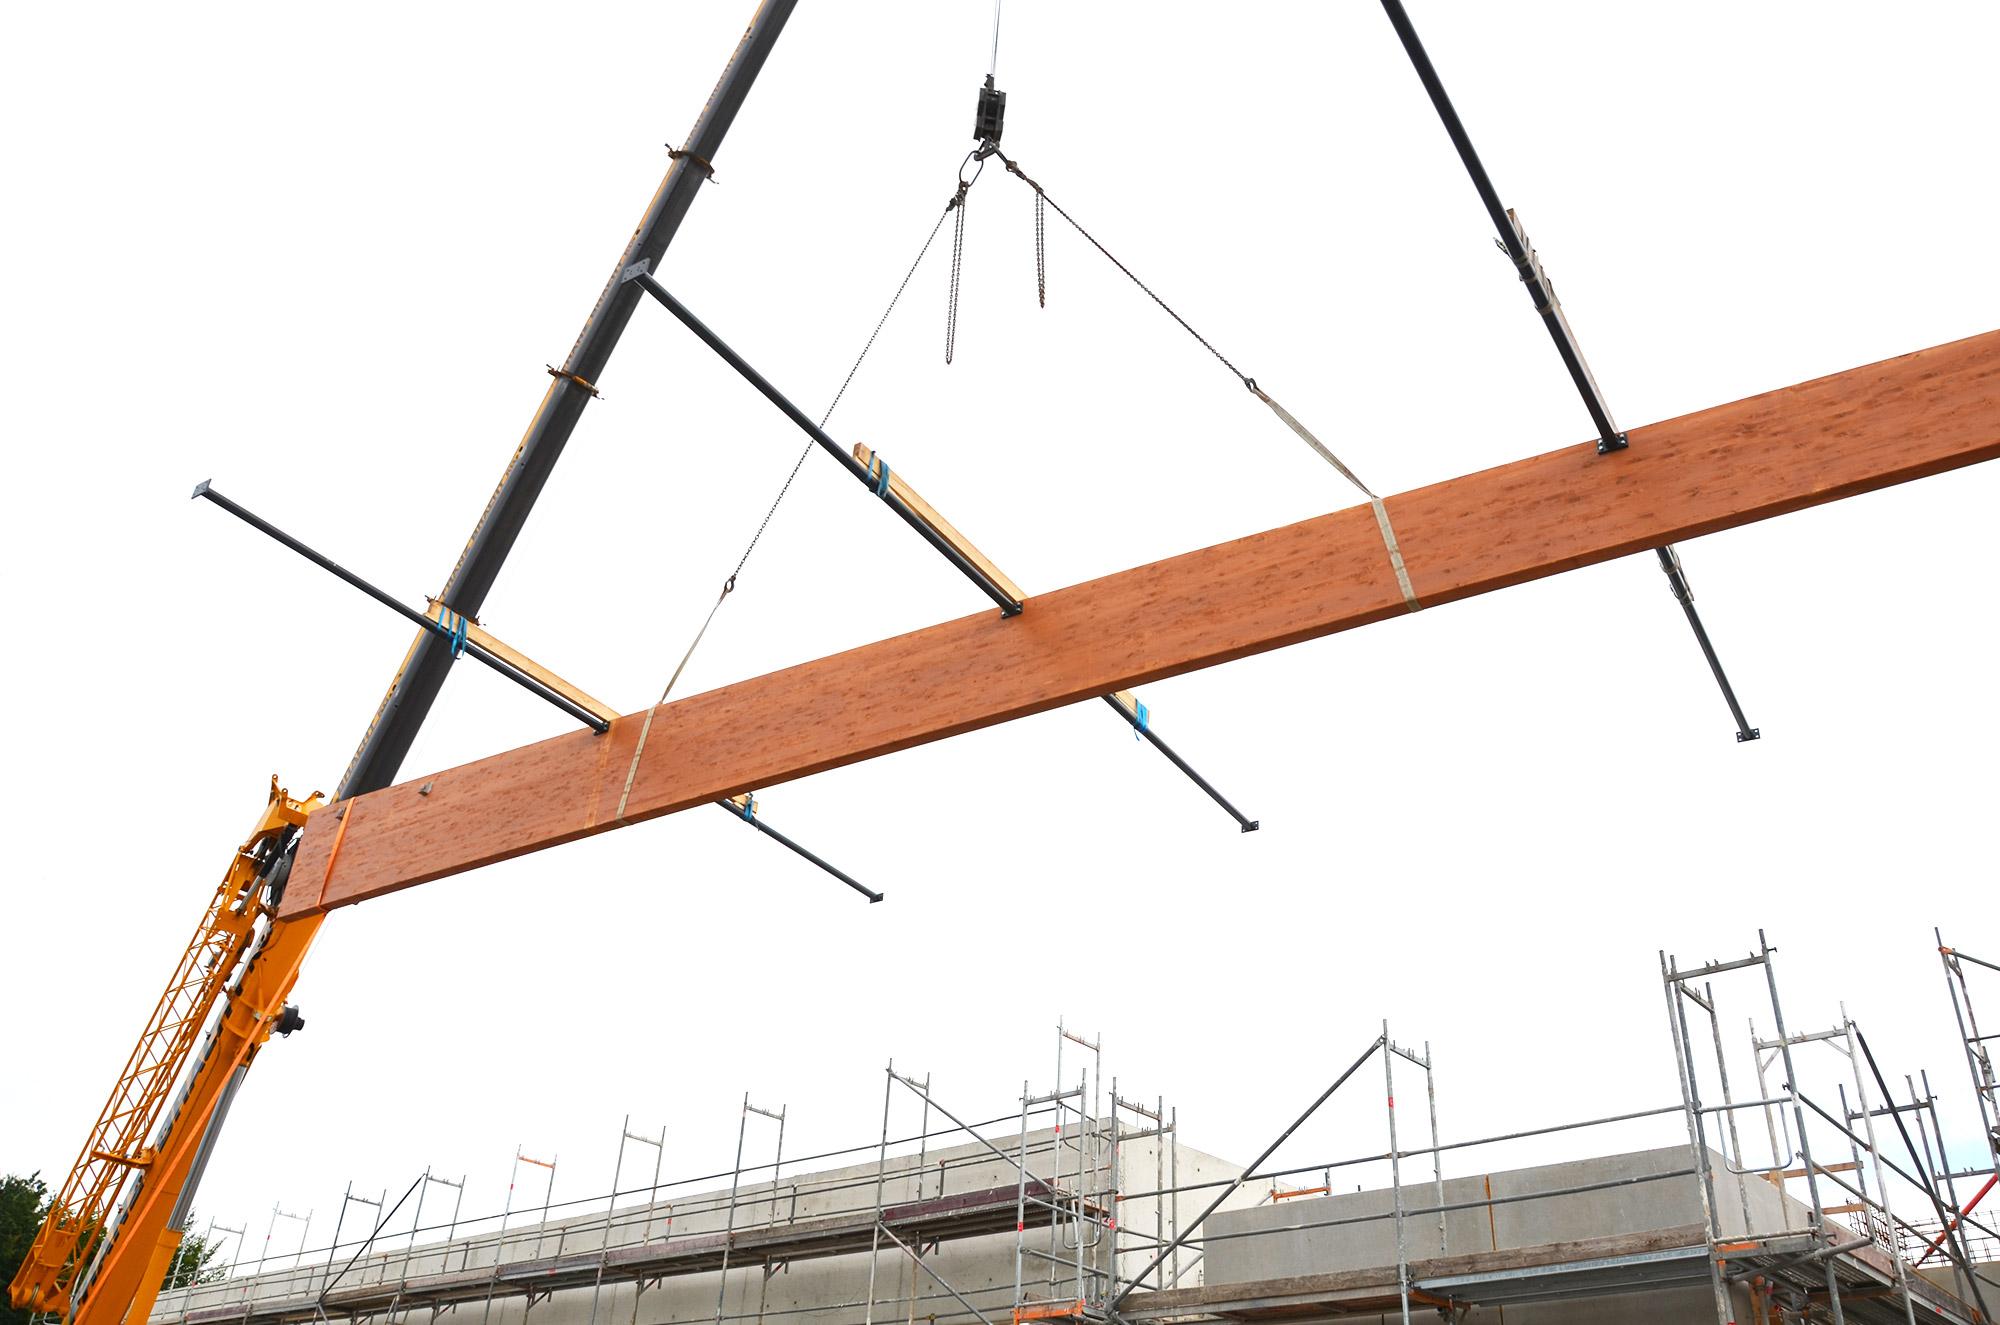 Holzingenieurbau Nordrhein Westfalen